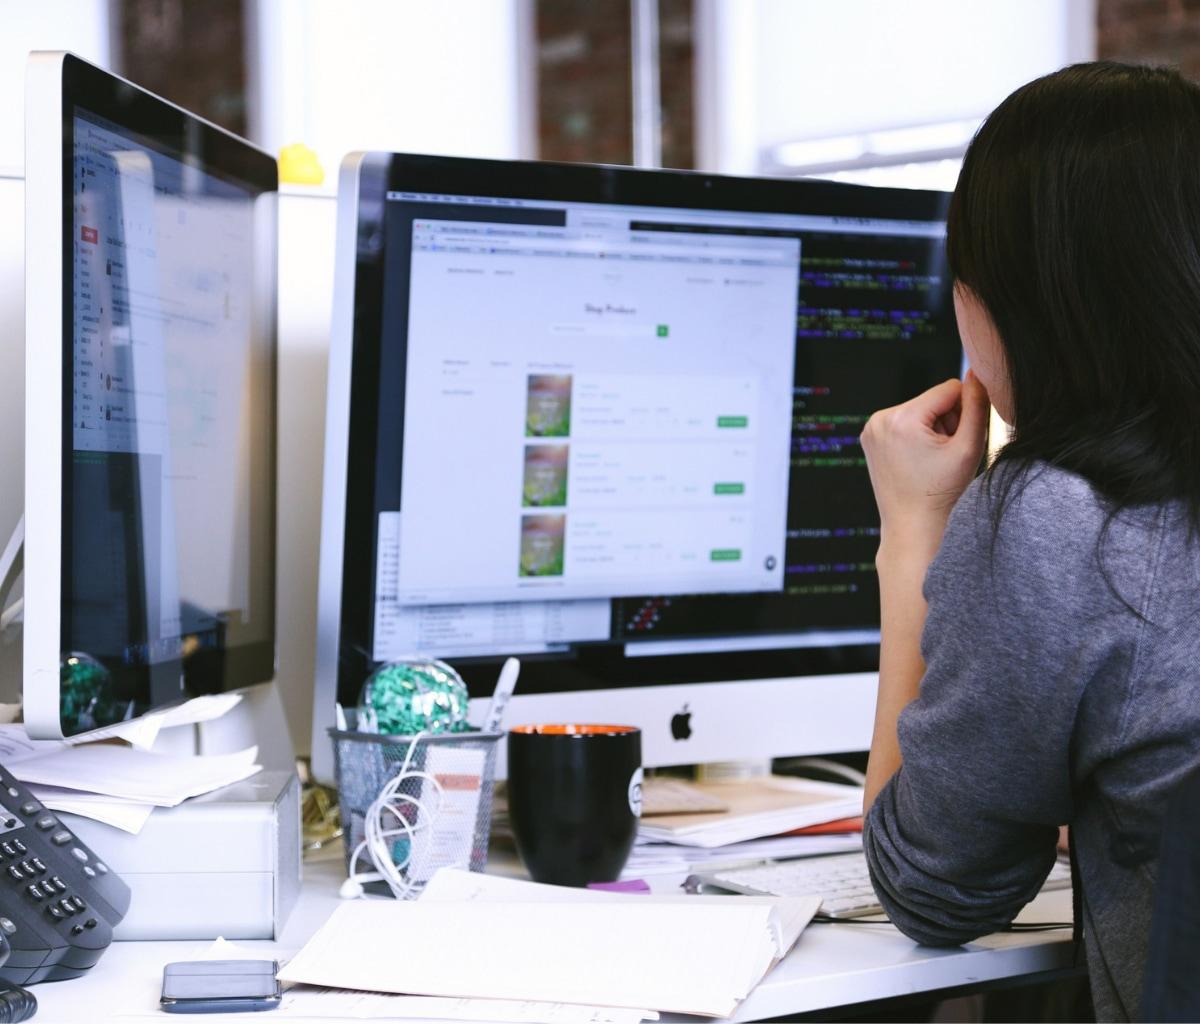 savvycom provides enterprise management solution